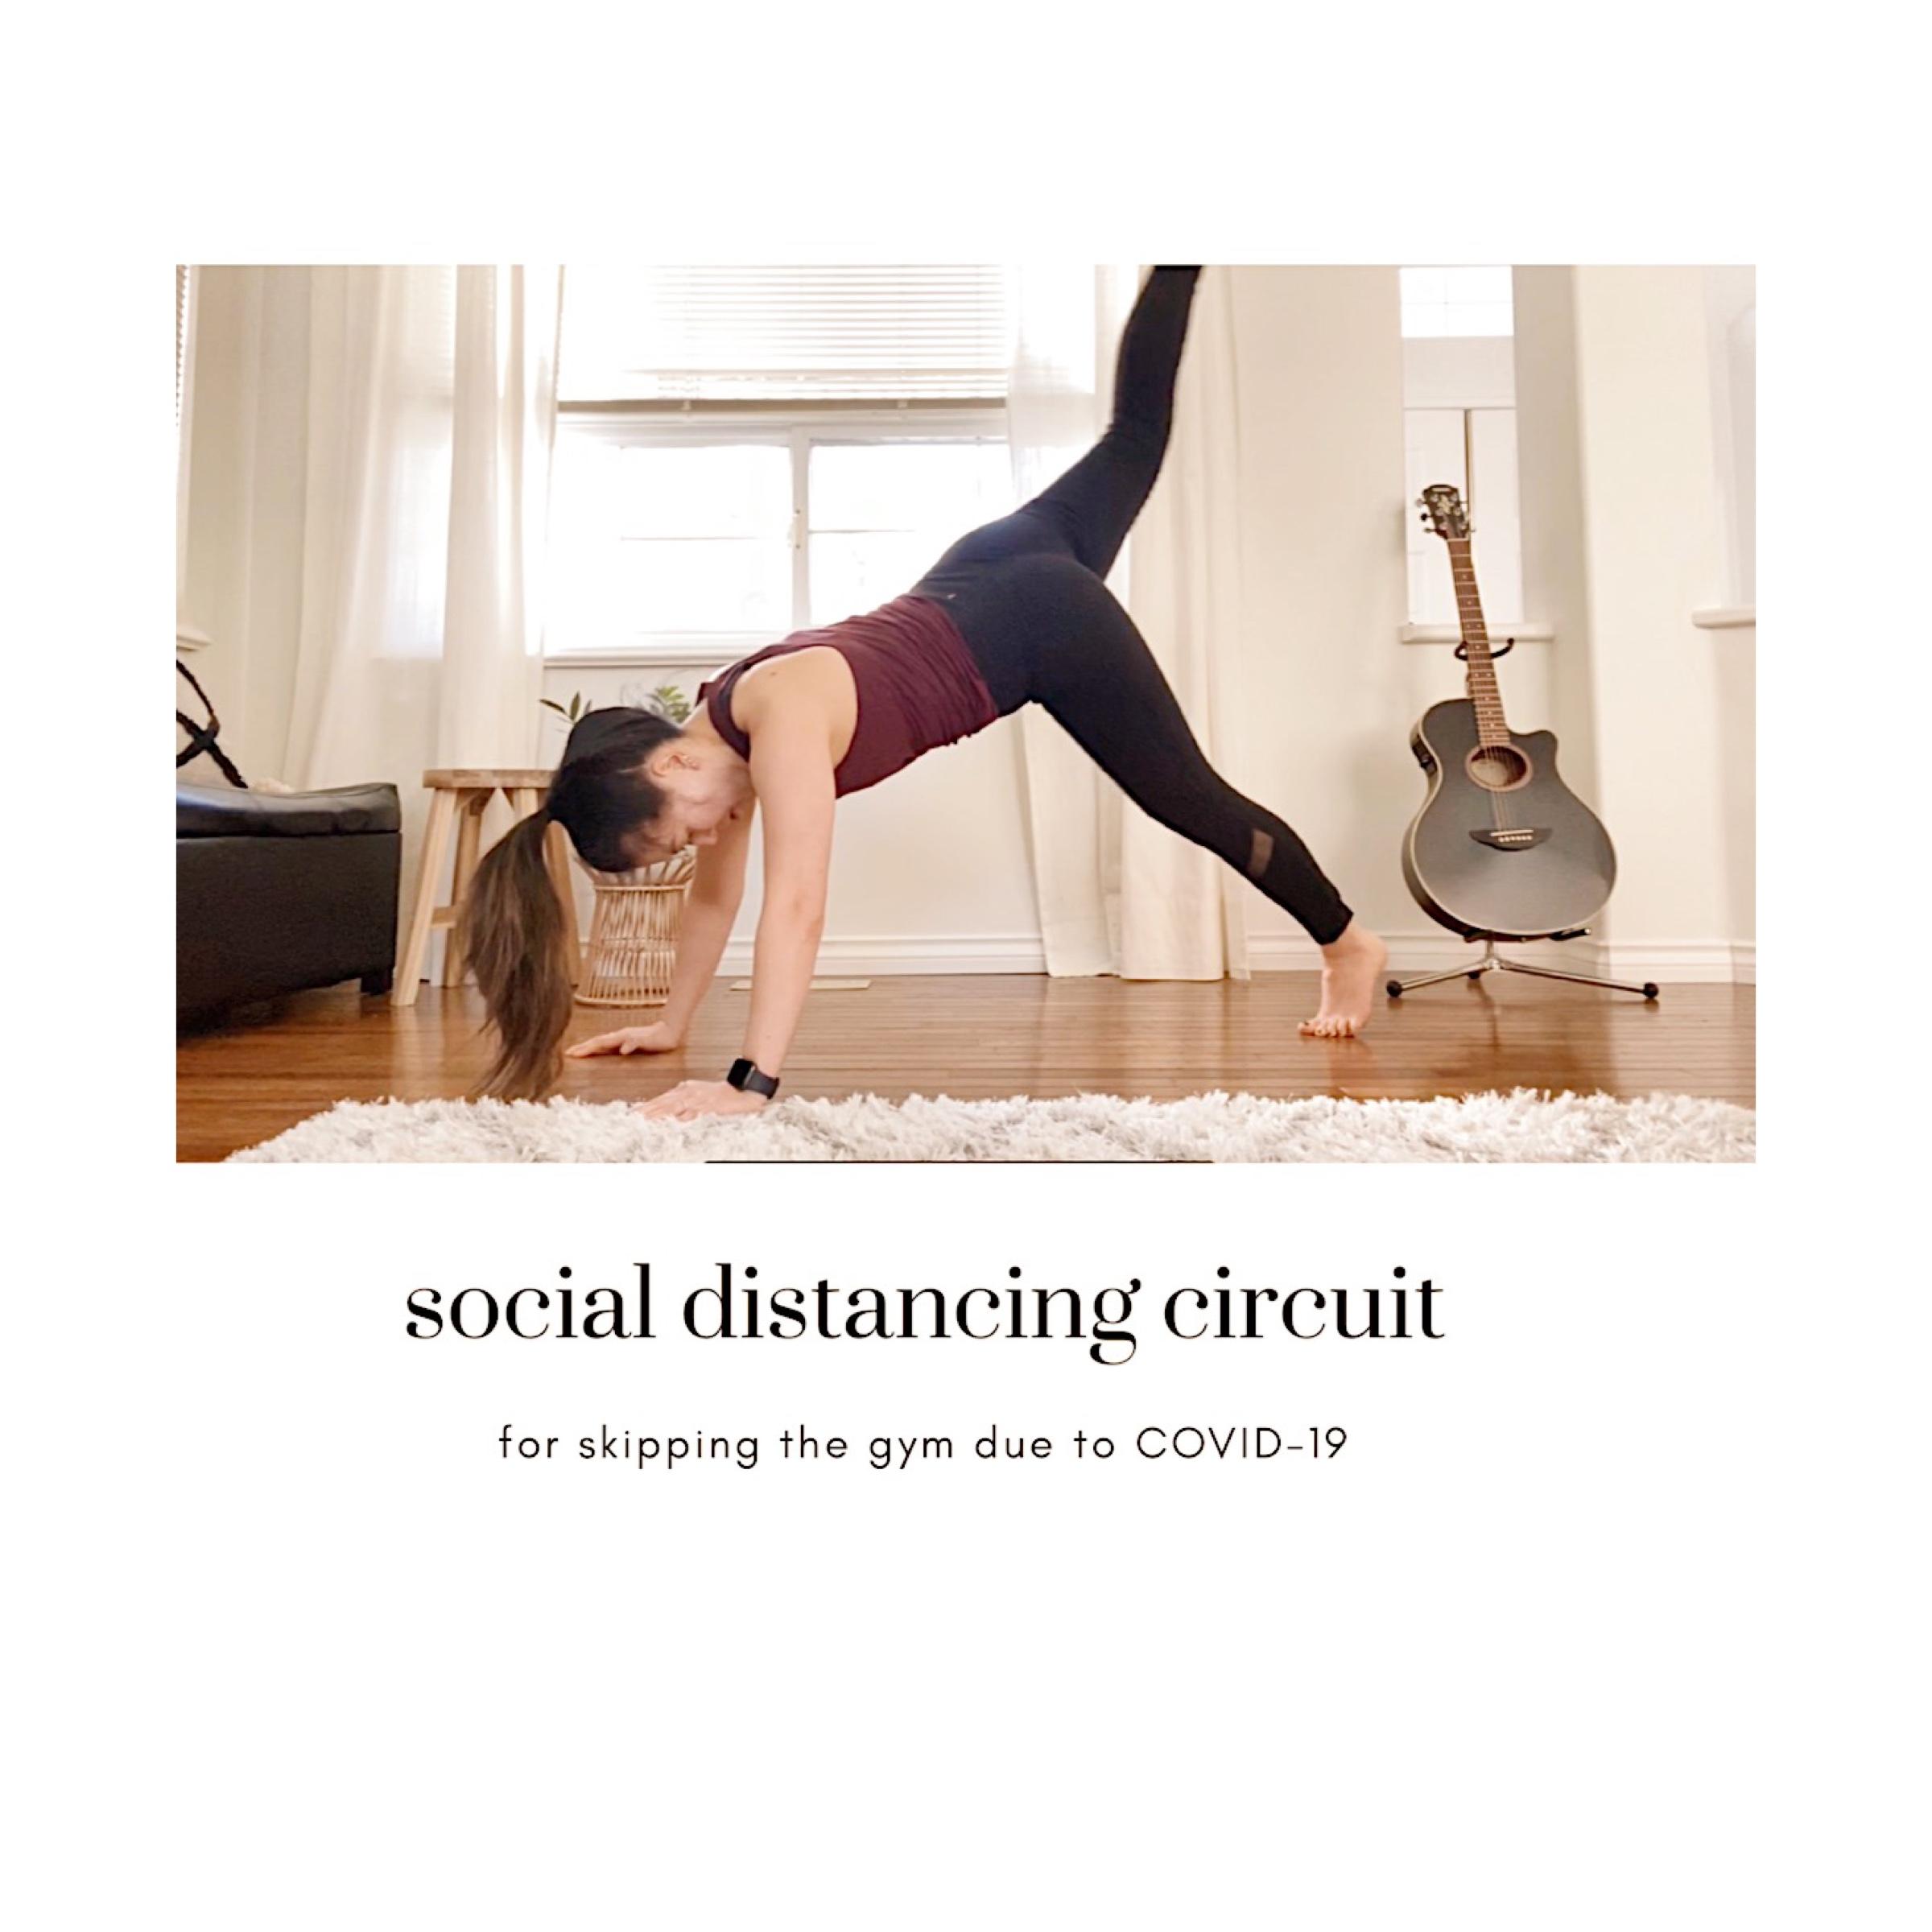 social distancing workout at home circuit